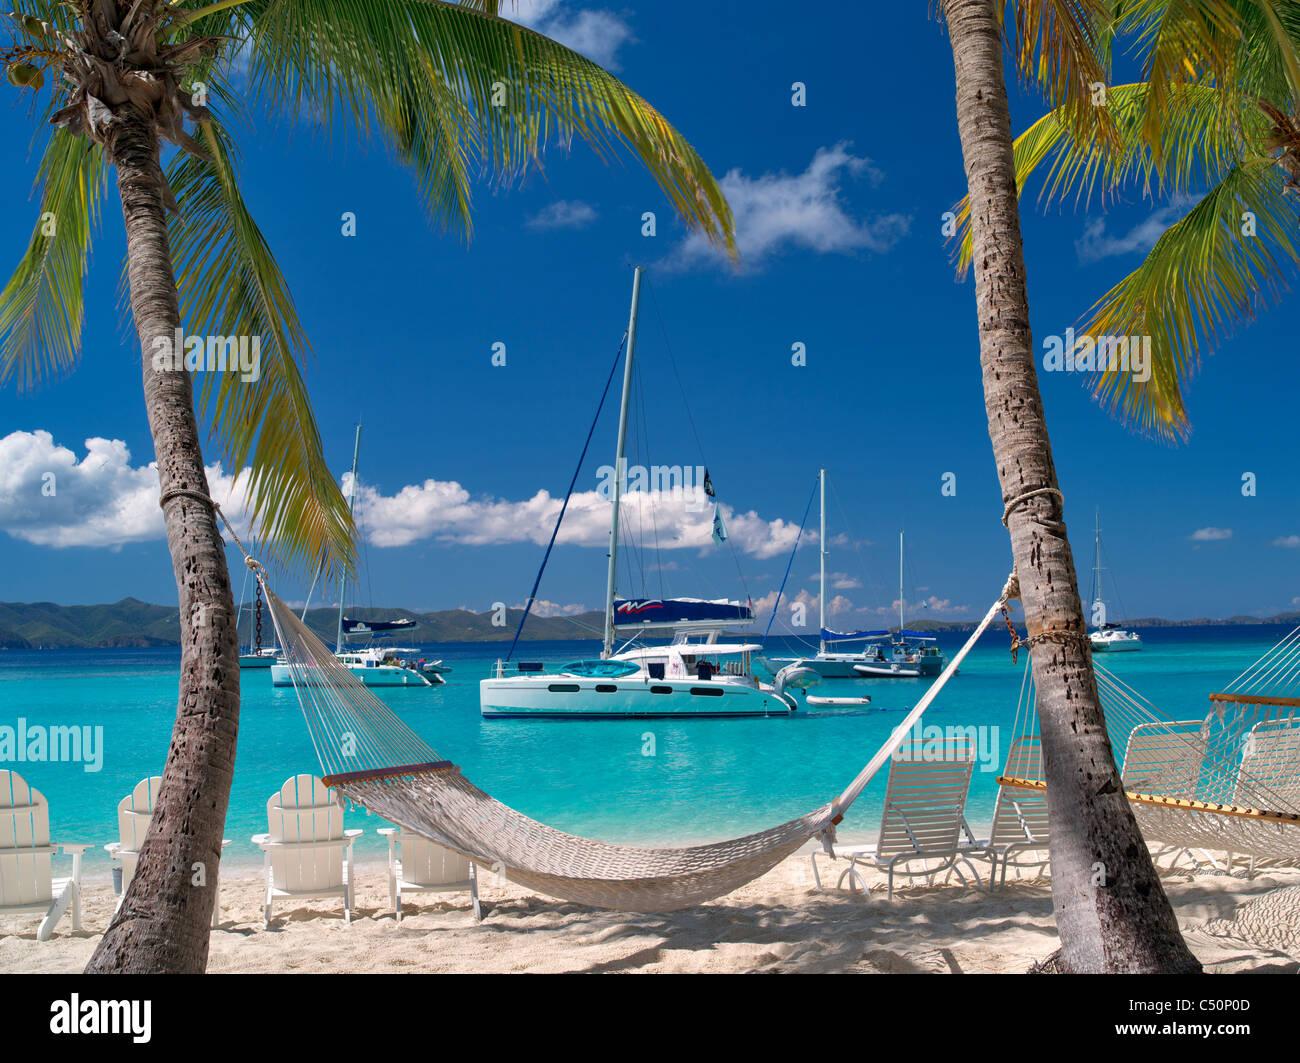 Boats and hammock at Jost Van Dyke. British Virgin Islands - Stock Image